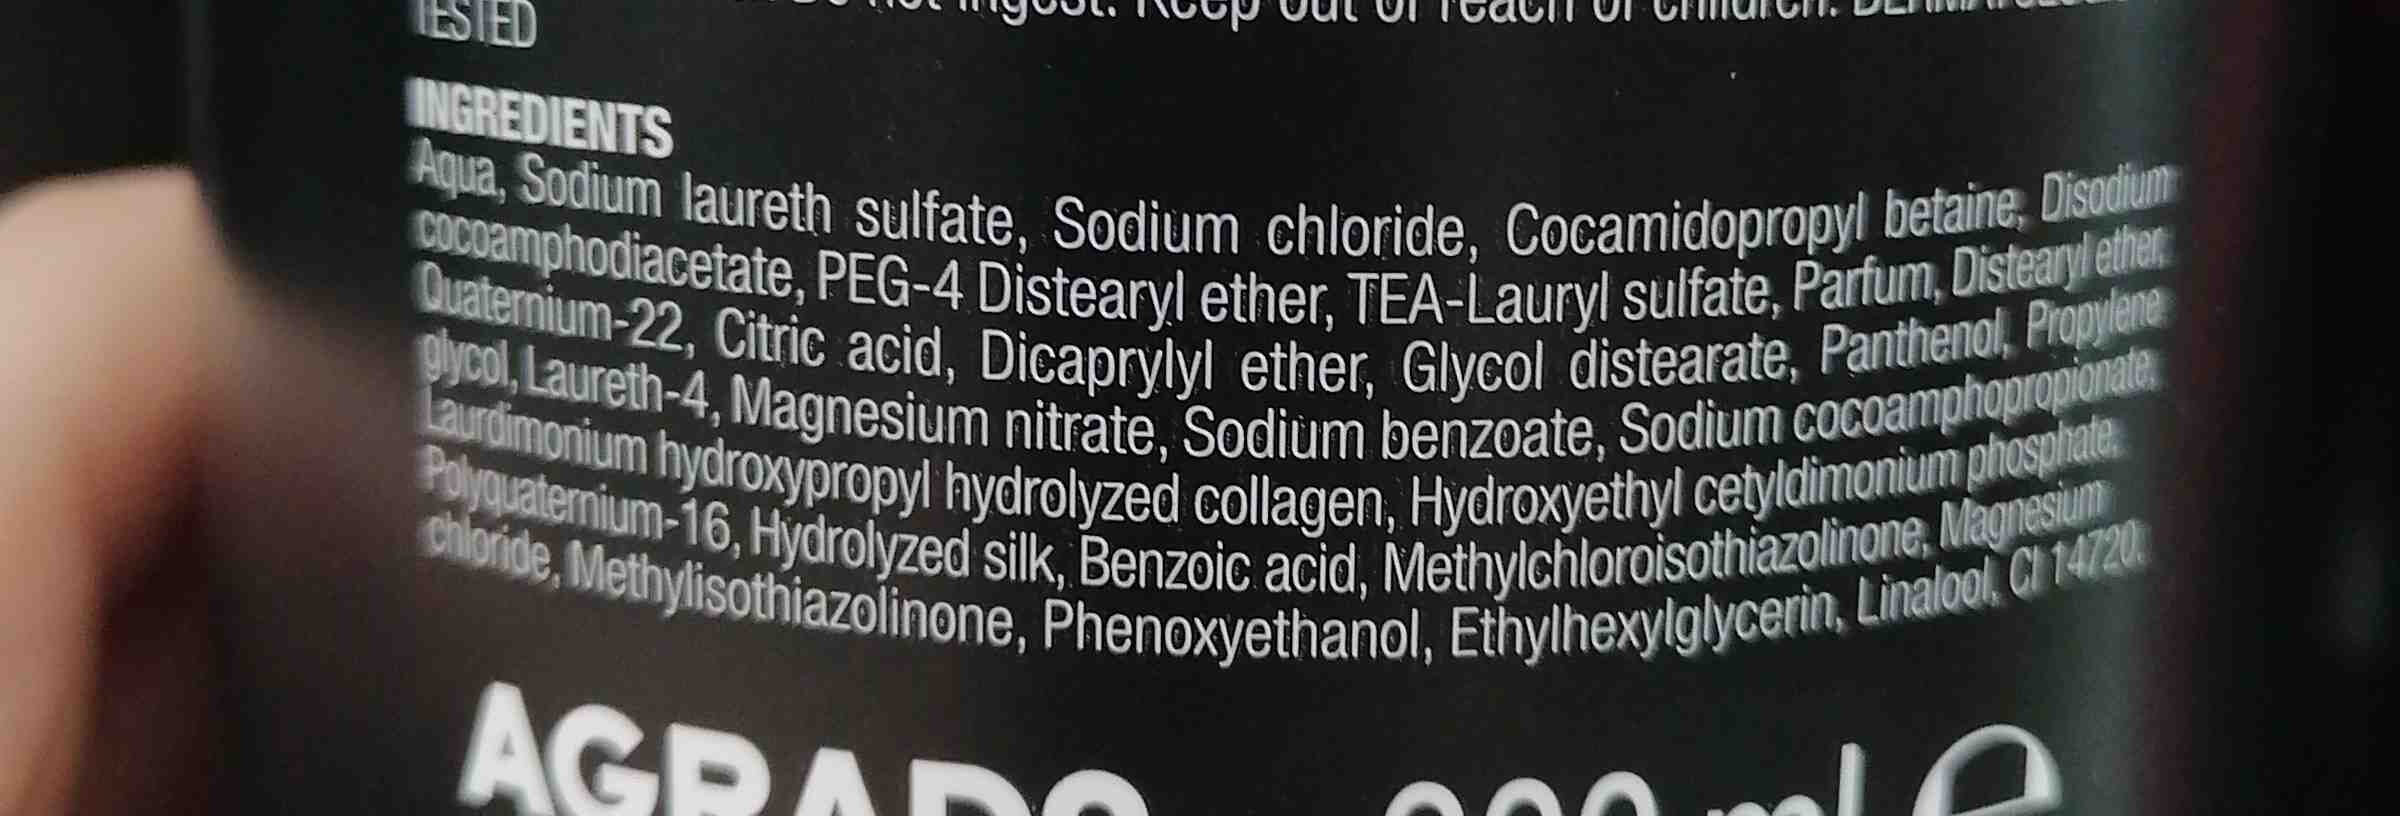 Agrado champu profesional - Ingredients - en